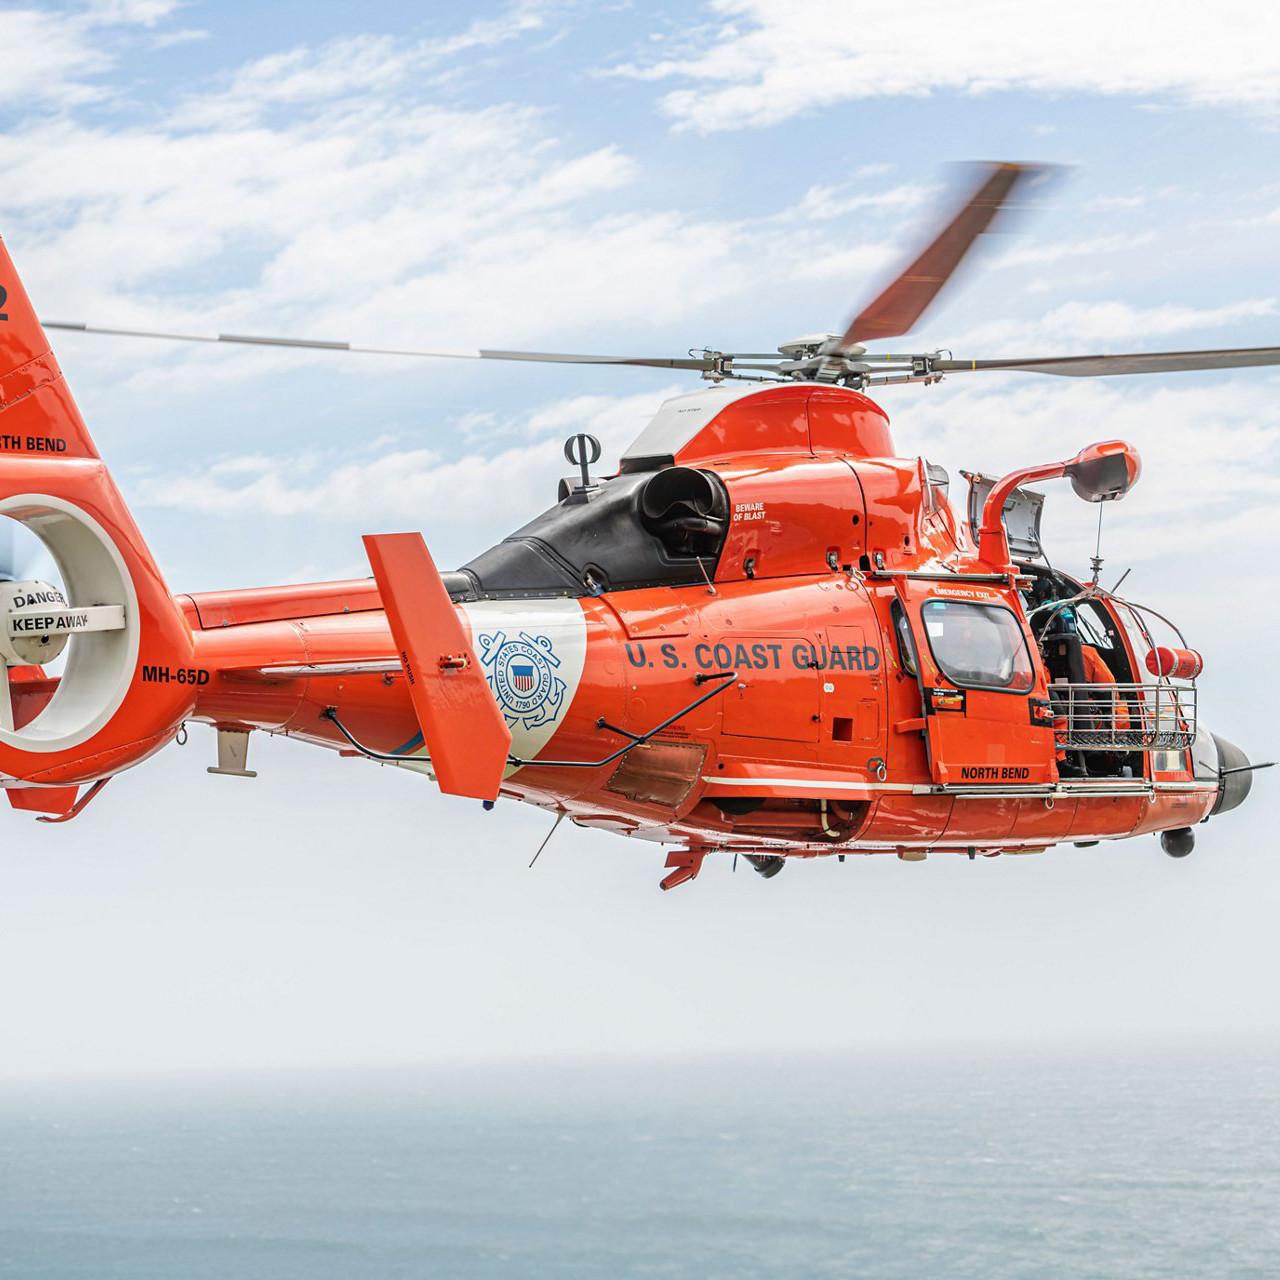 Airbus mark 40 year partnership with US Coast Guard